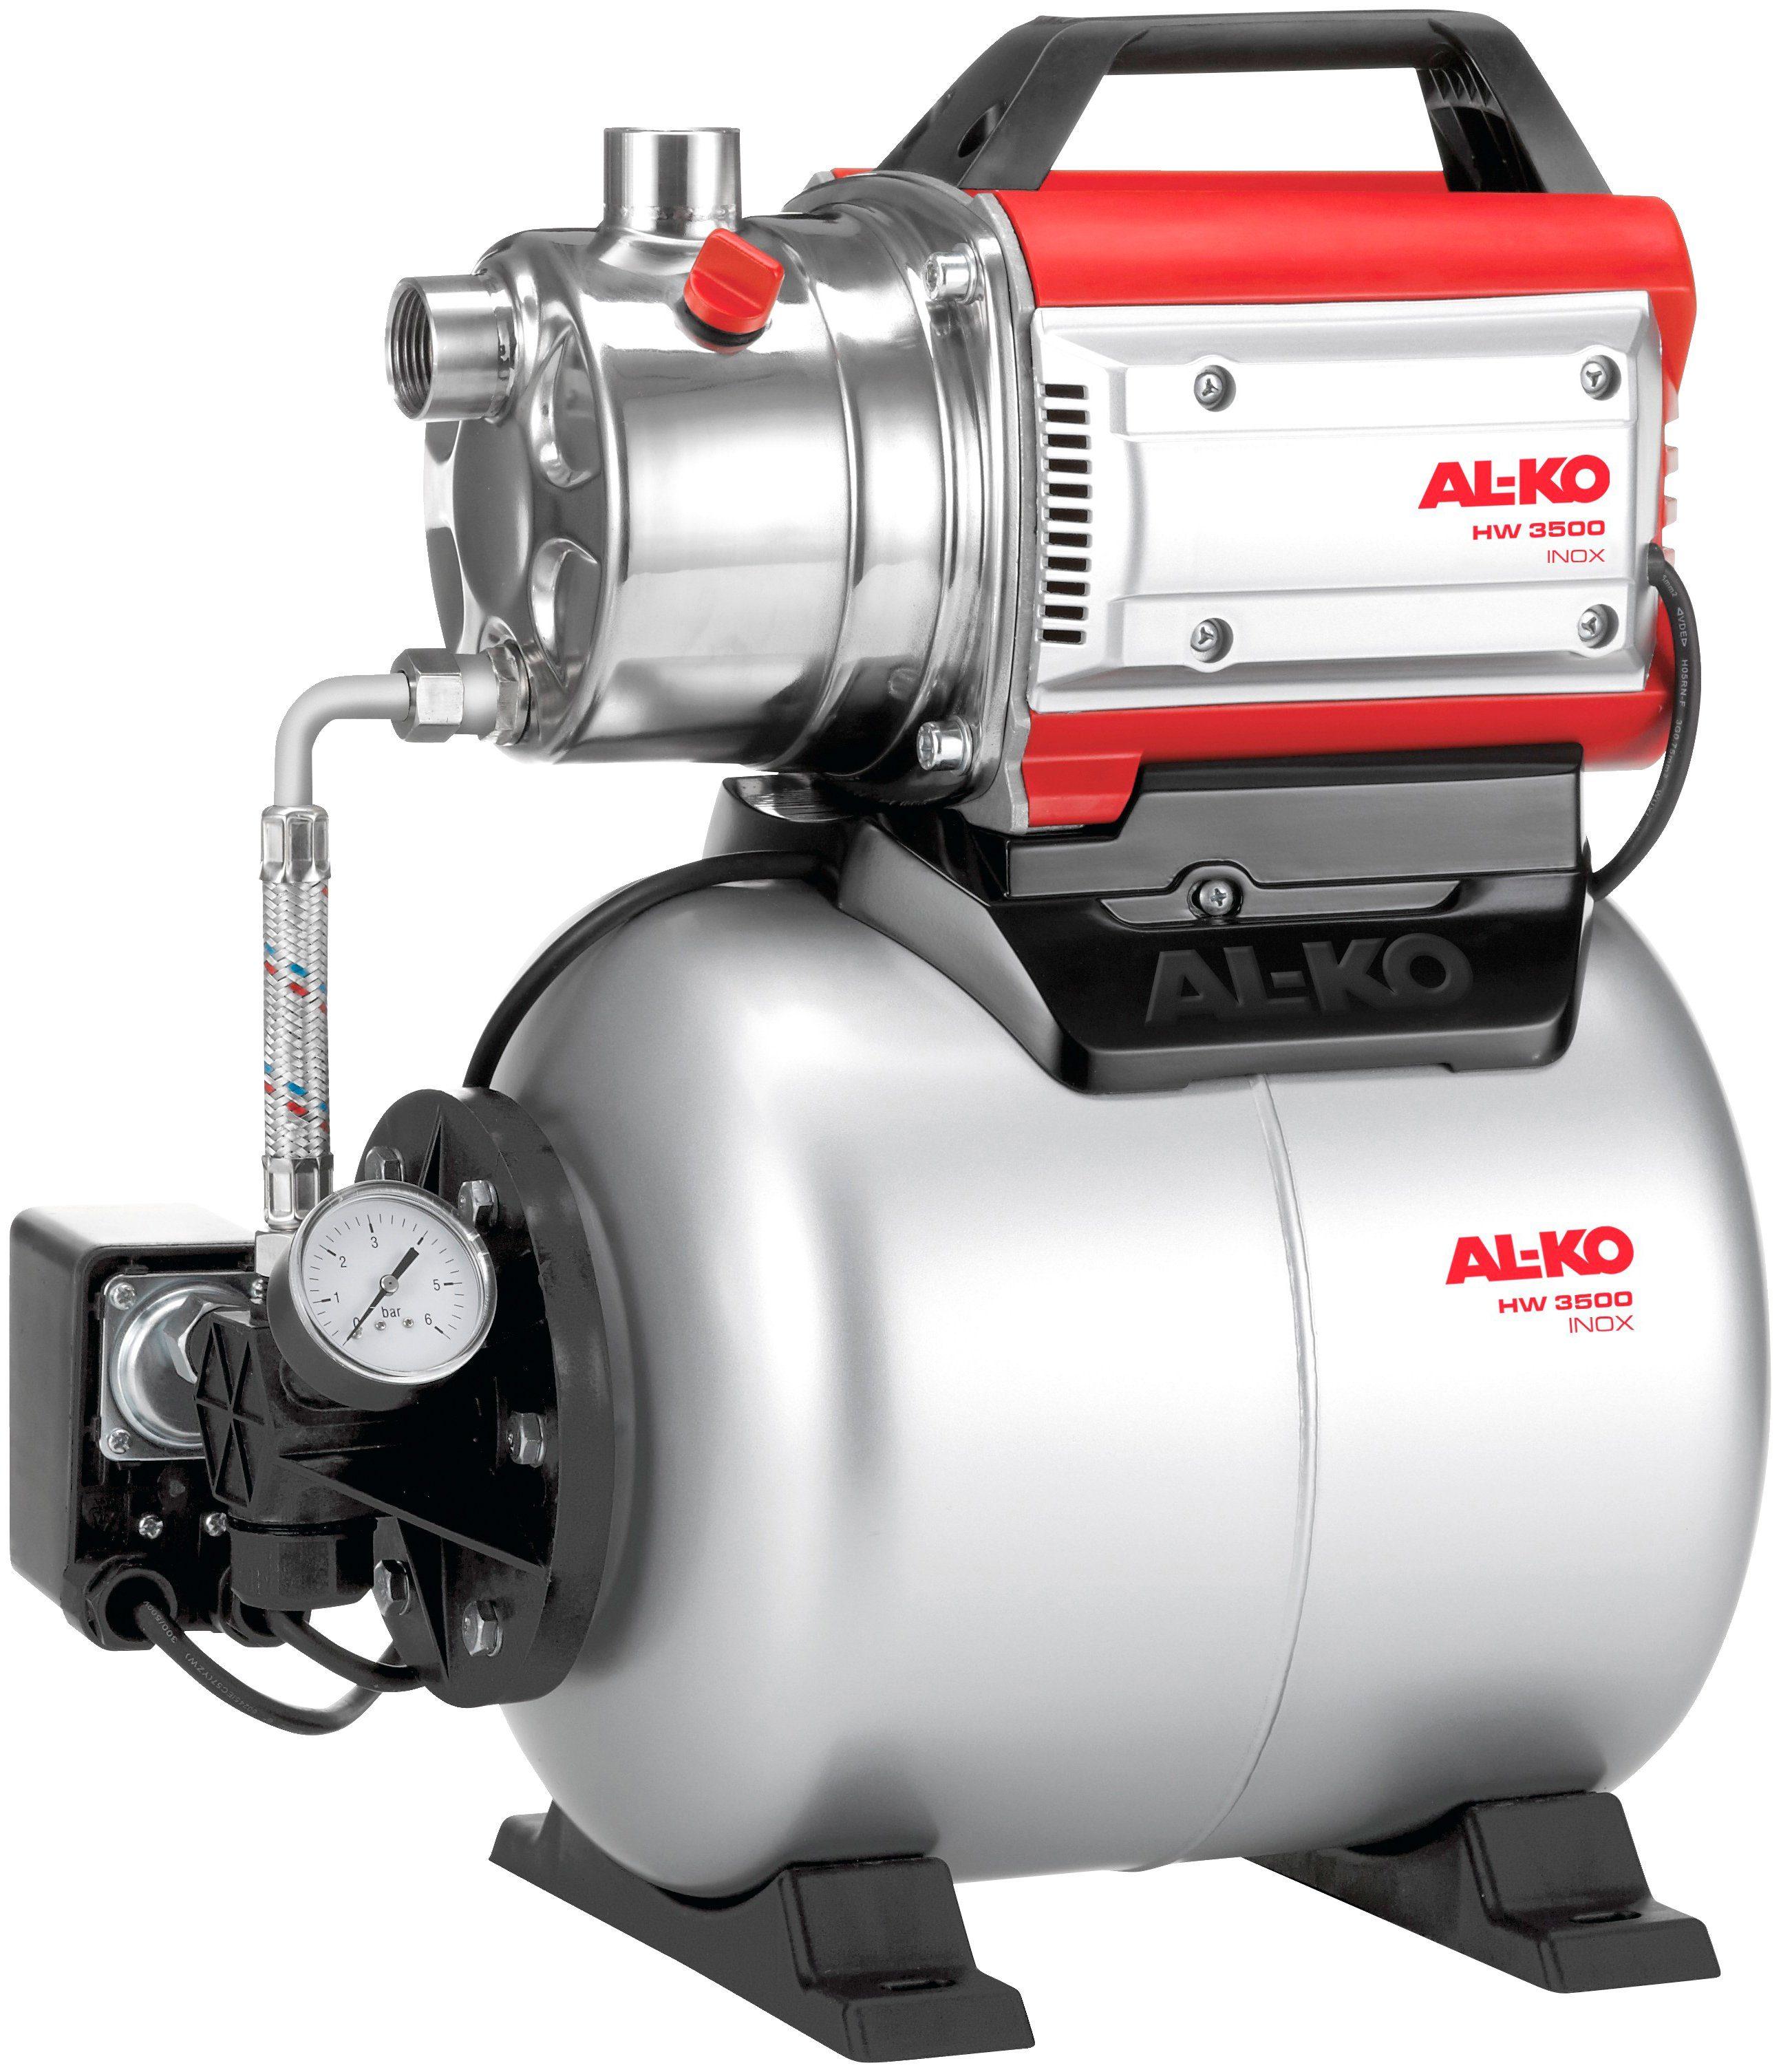 AL-KO Hauswasserwerk »HW 3500 INOX CLASSIC«